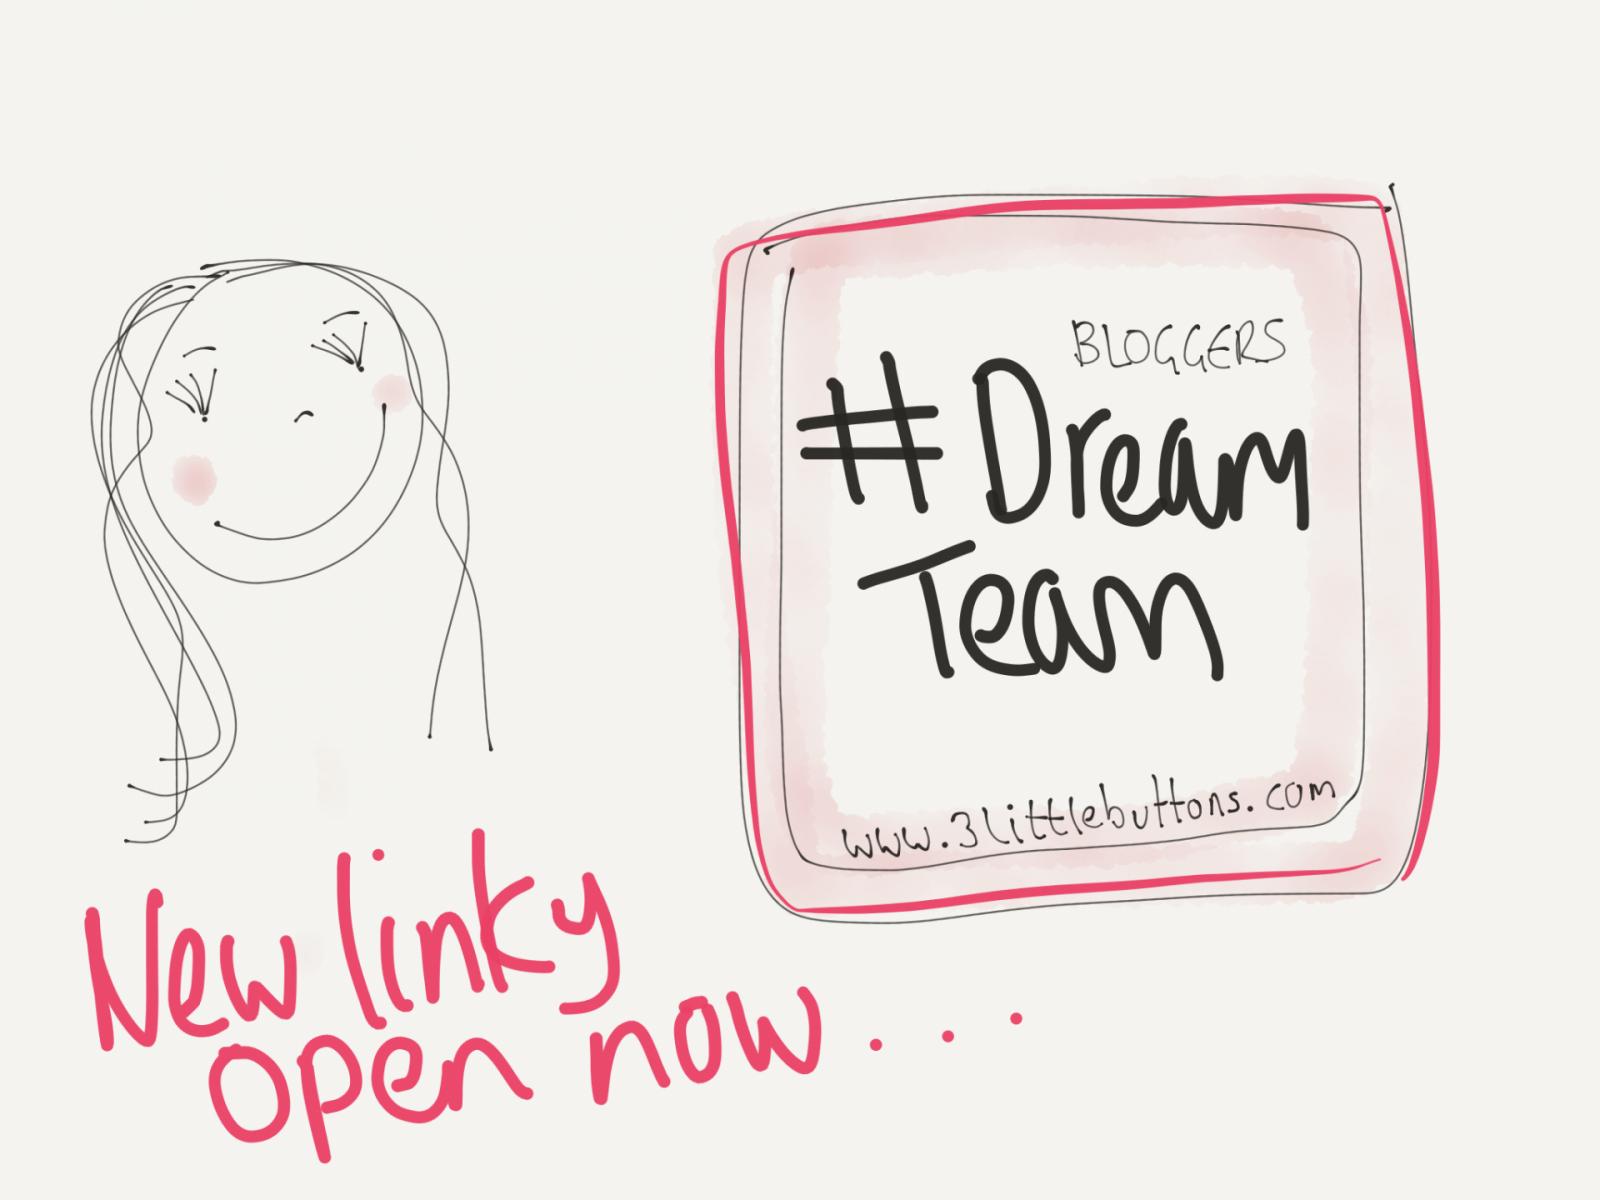 #DreamTeam Linky 5